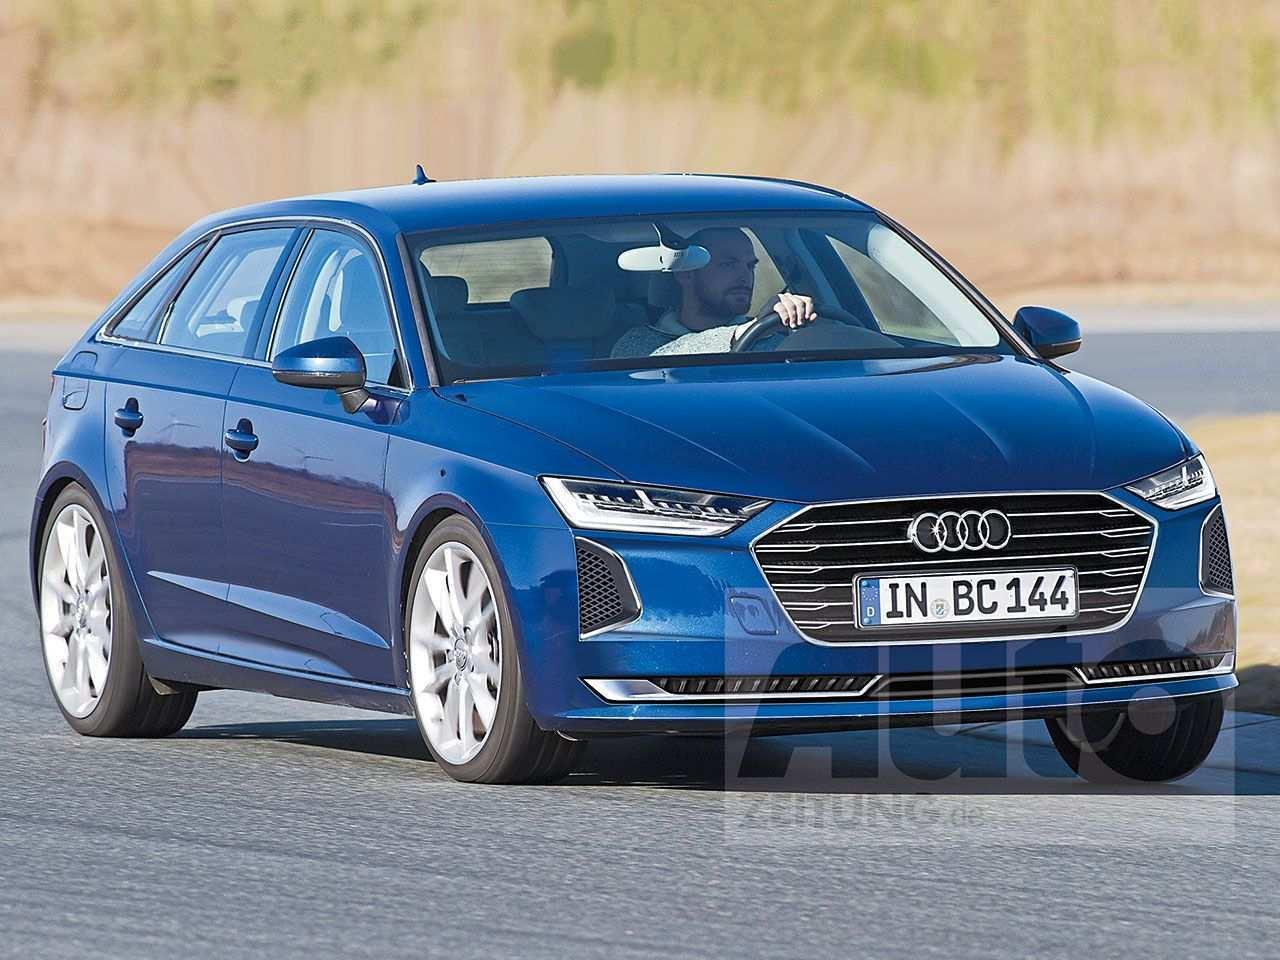 25 Concept of 2020 Audi Q4s Engine by 2020 Audi Q4s